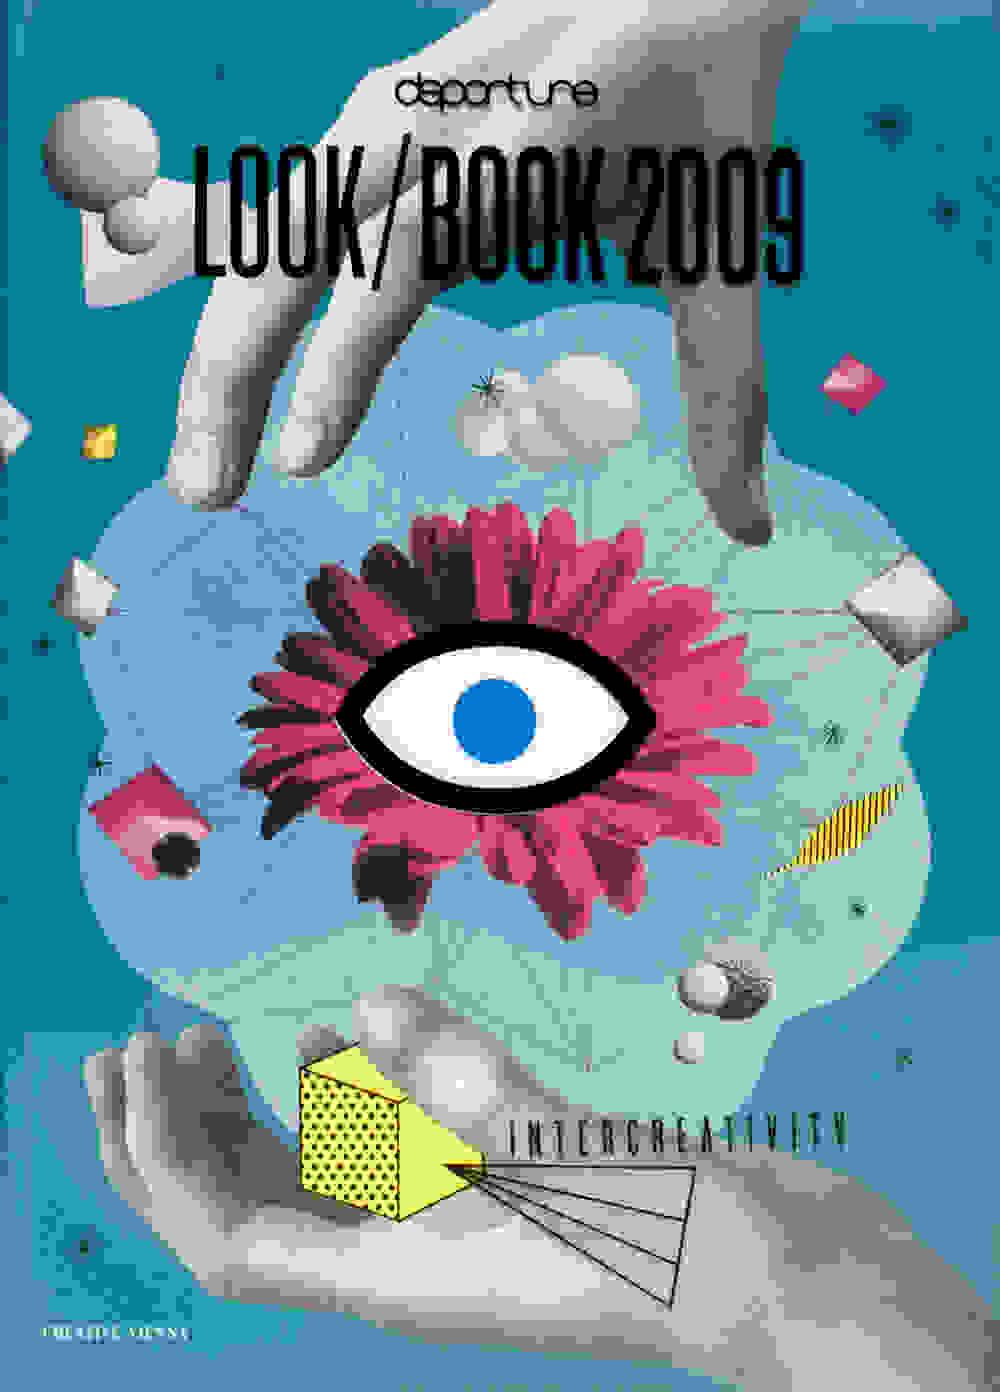 Departure Lookbook2009 Cover 0